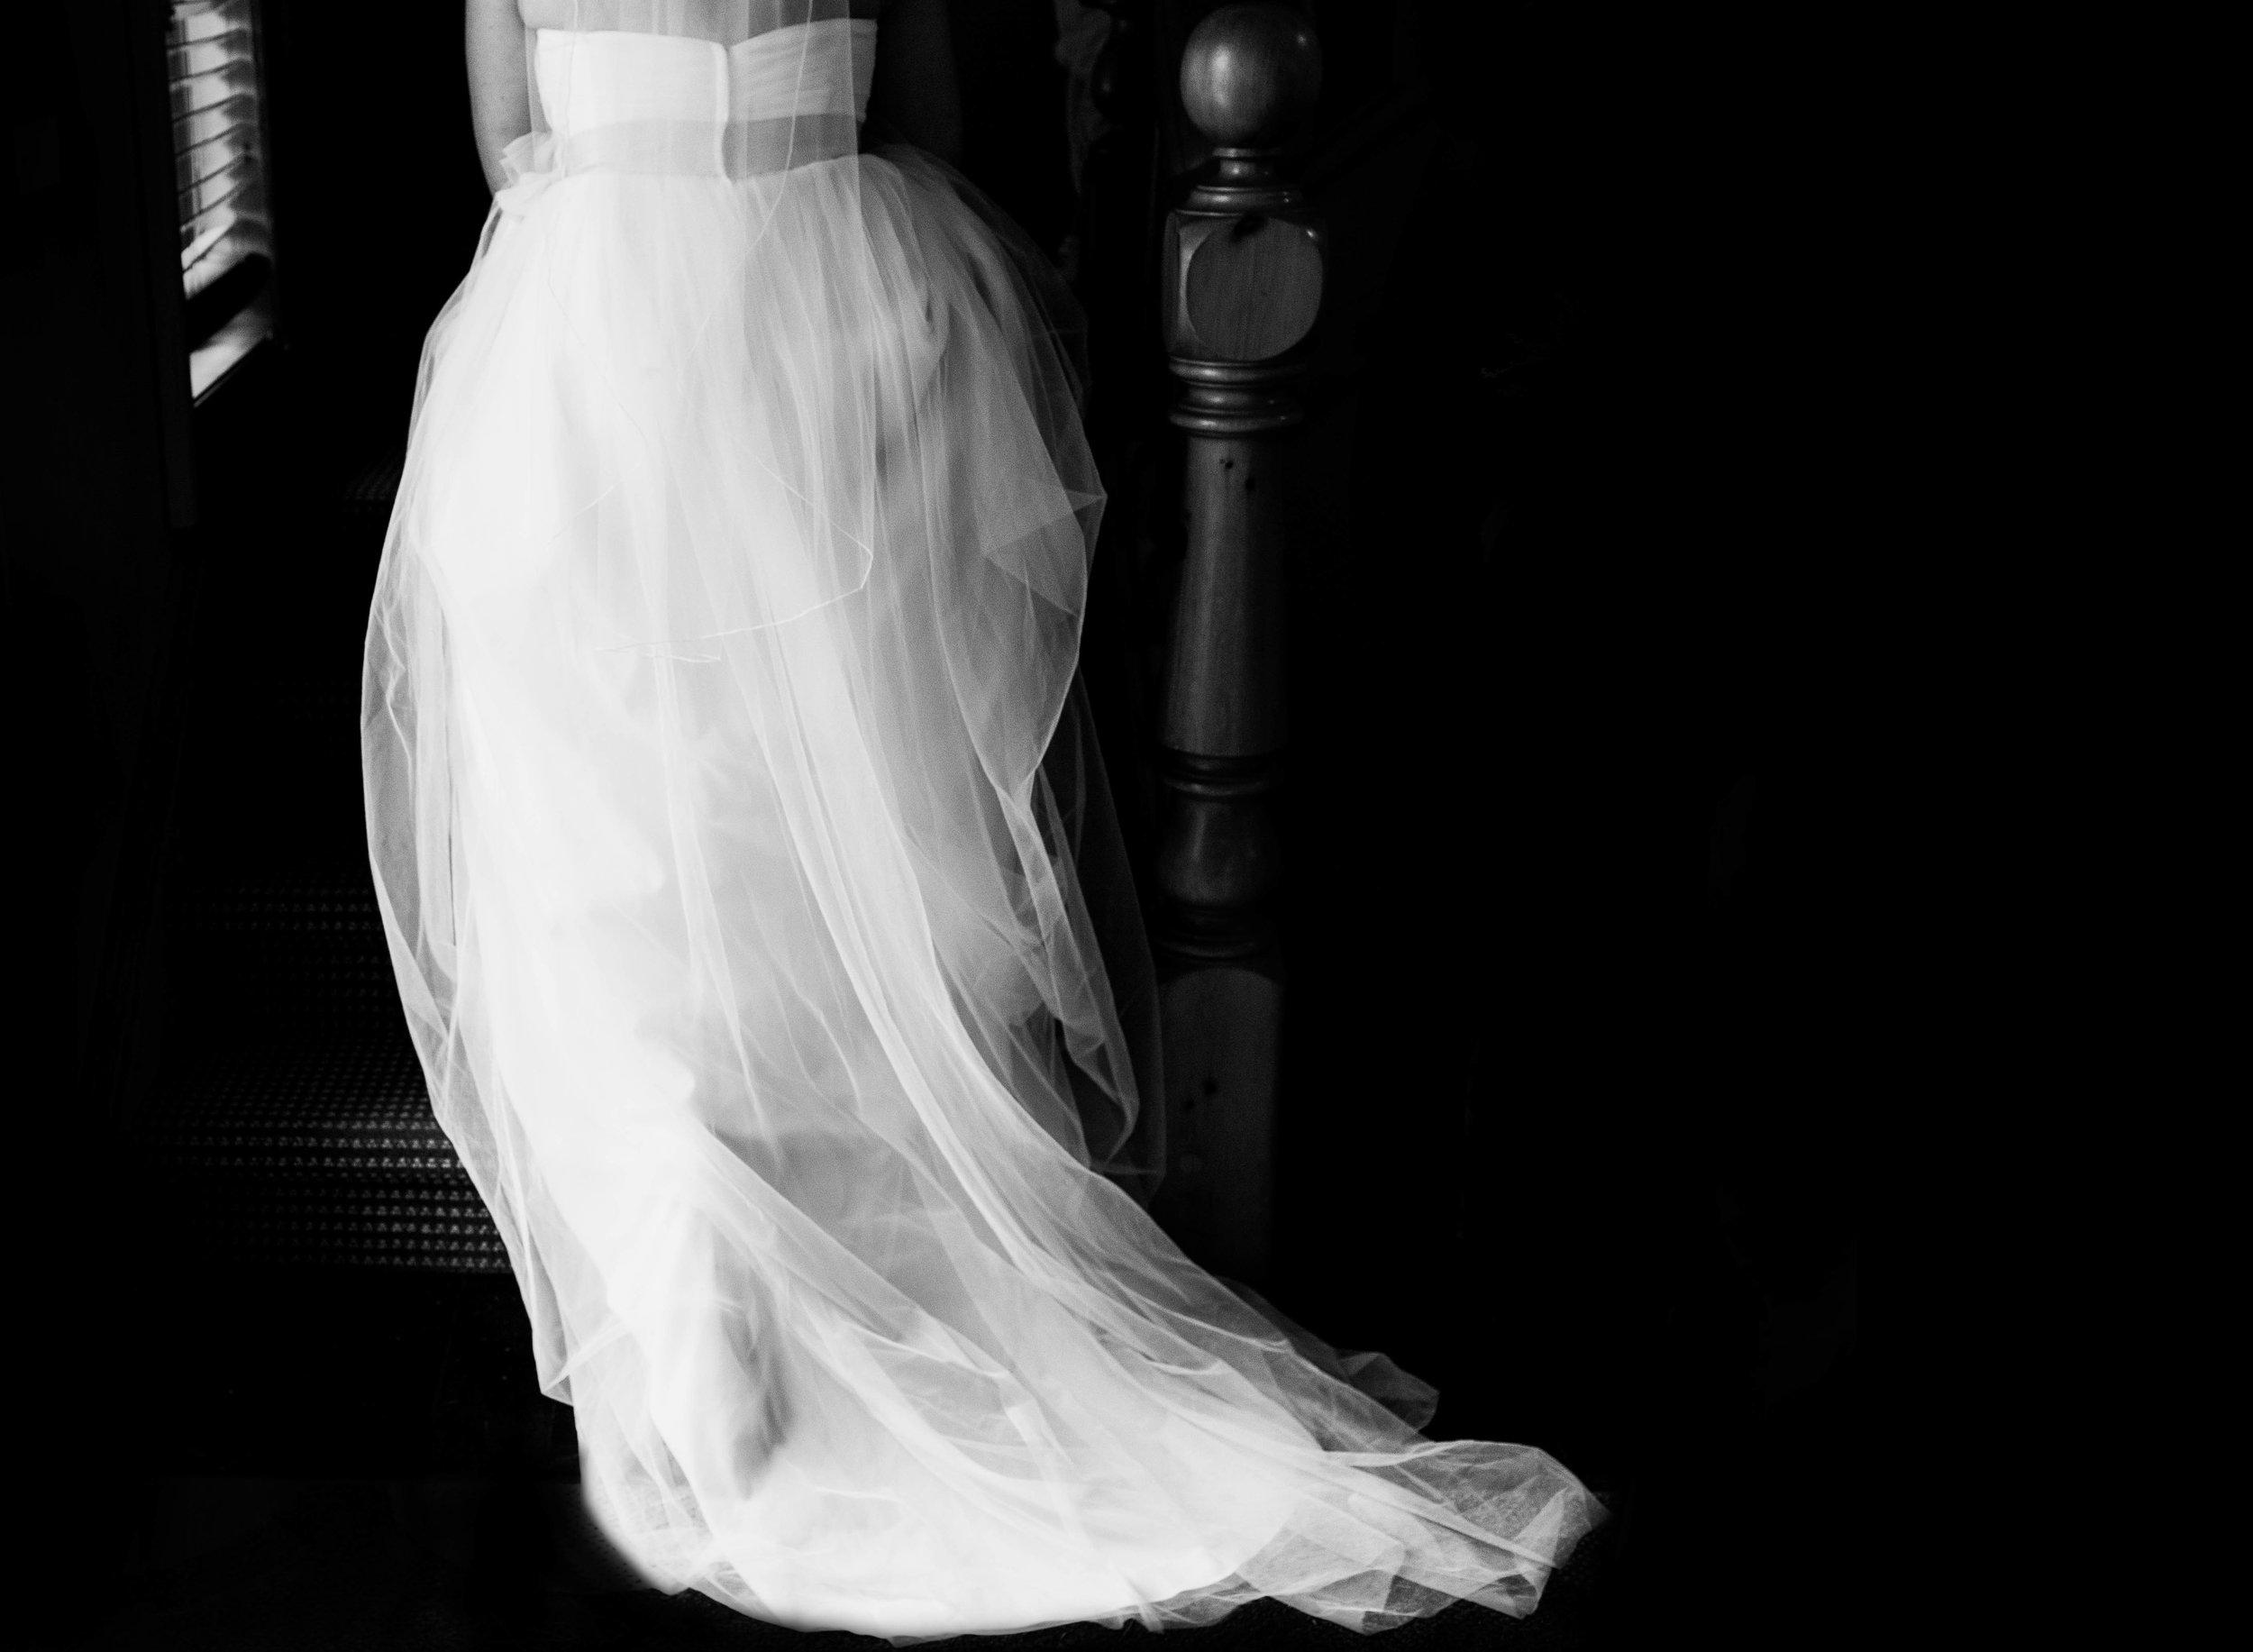 Morgan Bress Photography | Lindsay Wedding Photographer | Kawartha Lakes Wedding Photographer | Ontario Wedding Photographer | Golf Course Wedding | Golfing | Country Club Wedding | Eganridge | Eganridge Resort | Country Club and Spa | Eganridge Resort Country Club and Spa